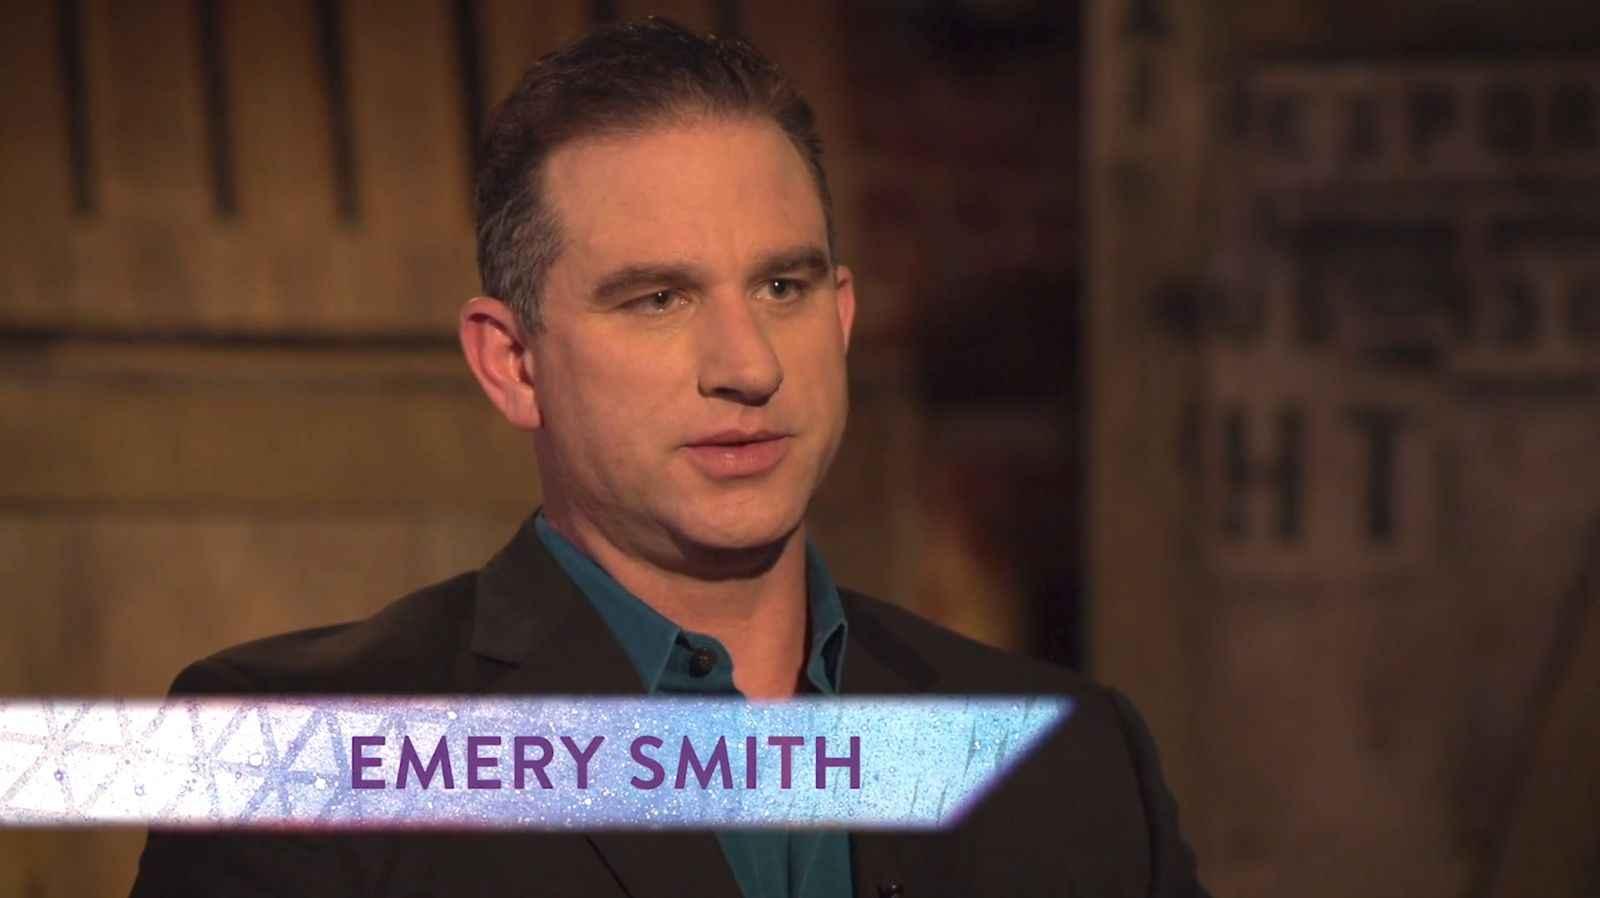 1 Emery Smith 3